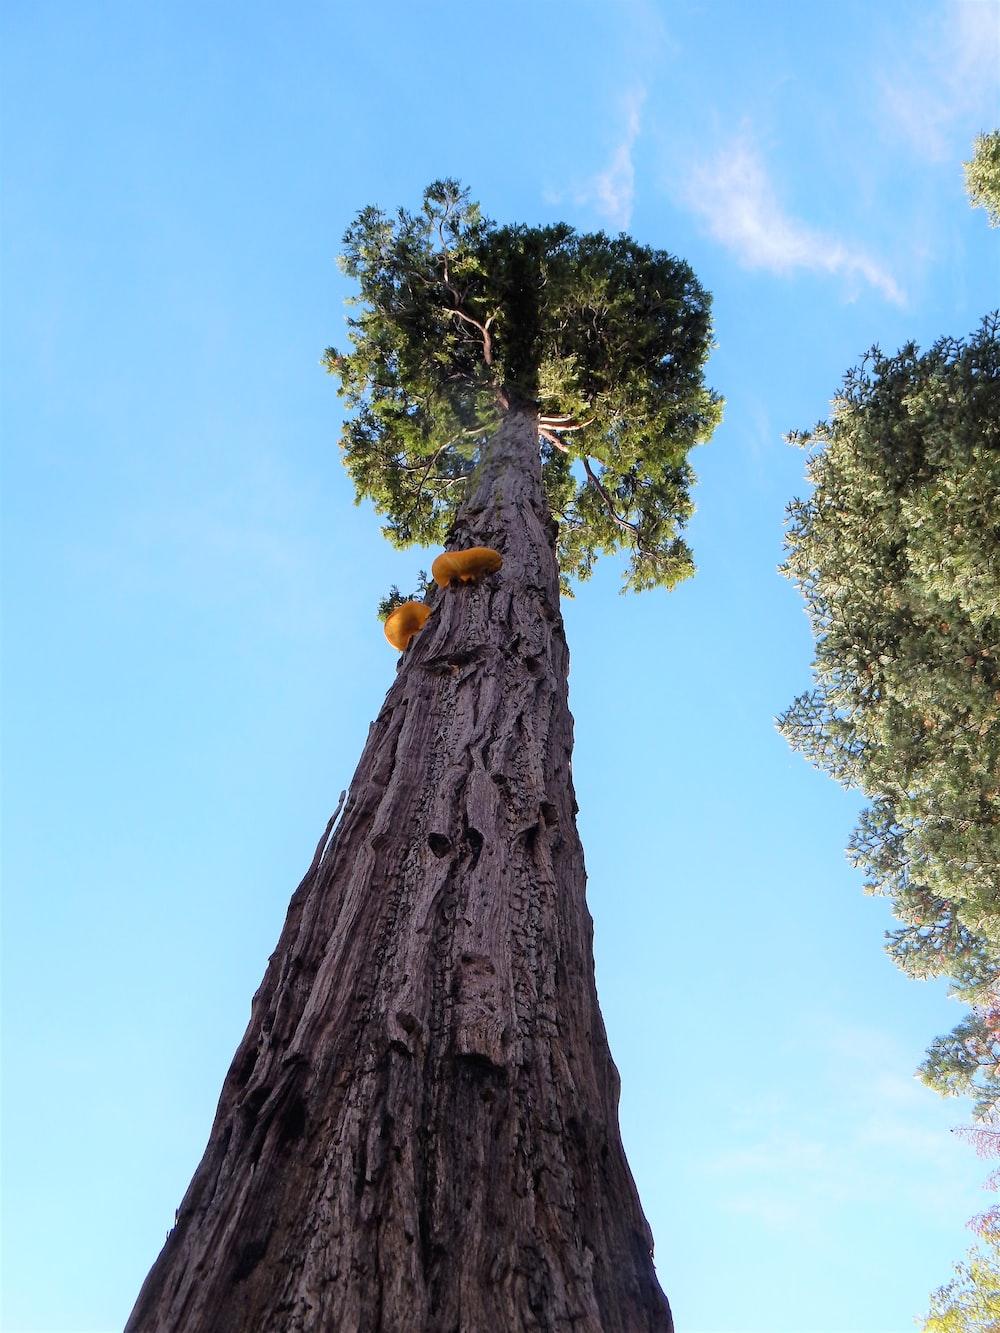 low-angle photo of tree